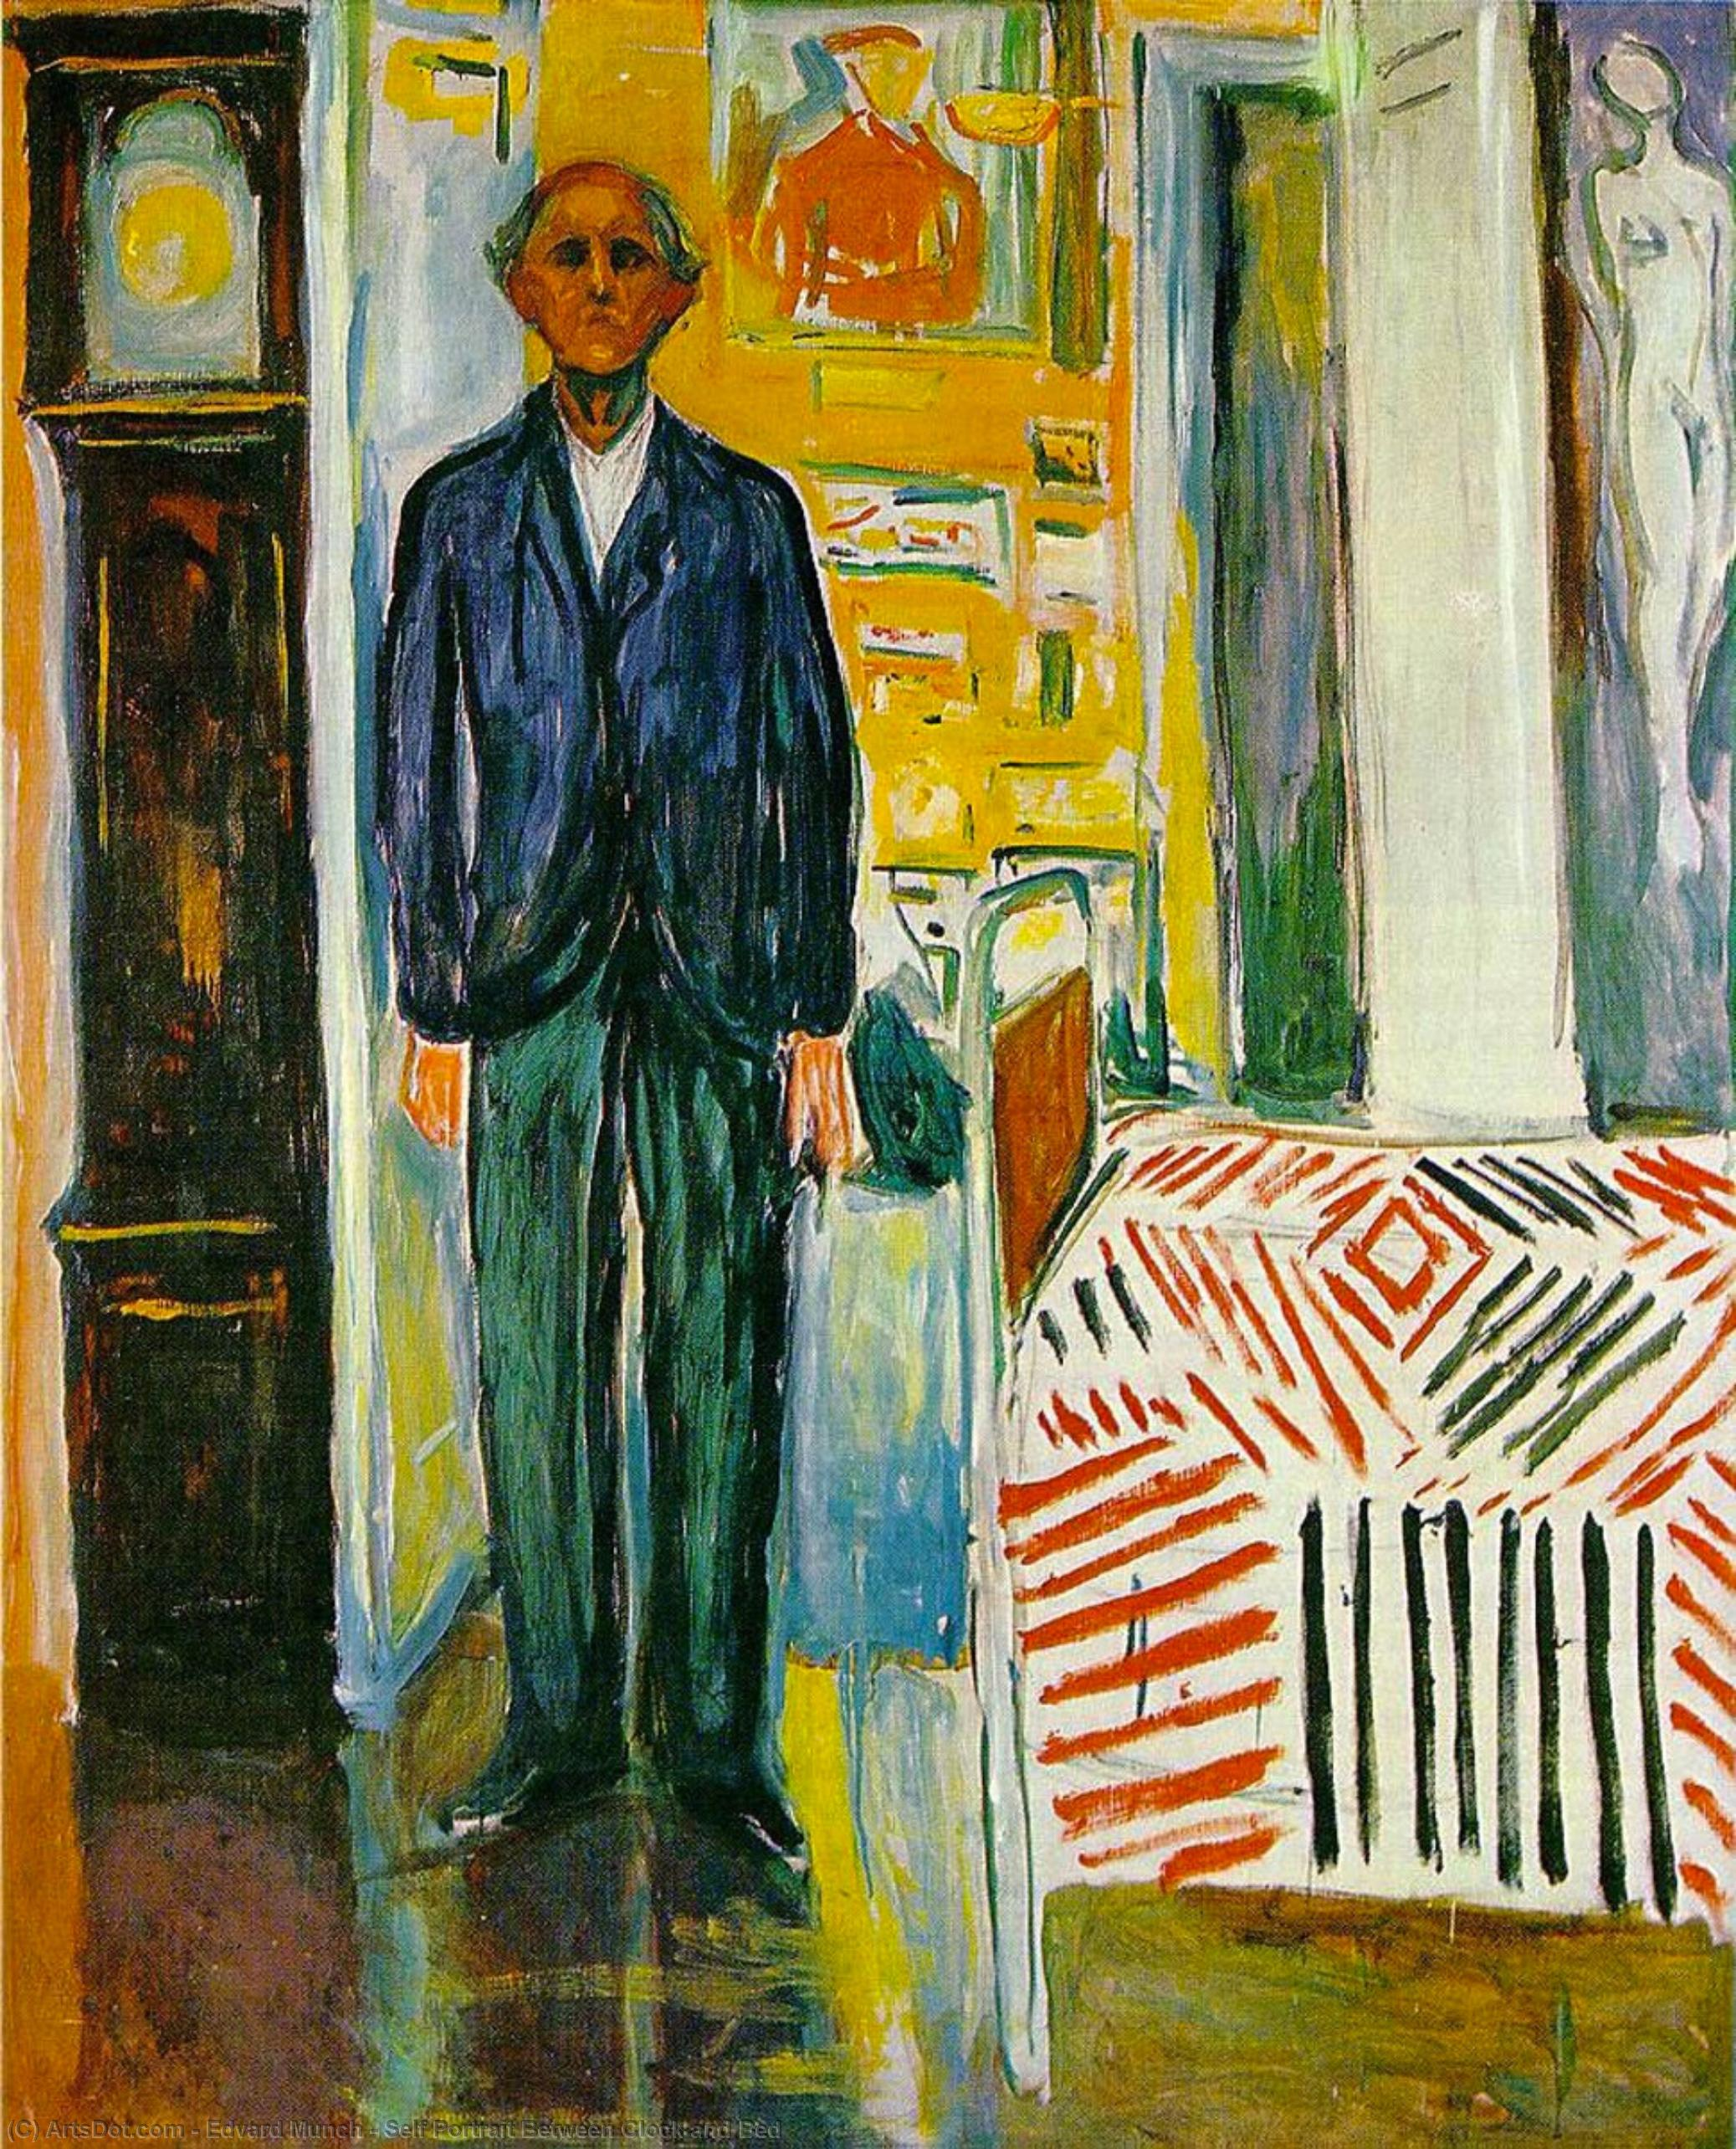 Wikoo.org - موسوعة الفنون الجميلة - اللوحة، العمل الفني Edvard Munch - Self Portrait Between Clock and Bed